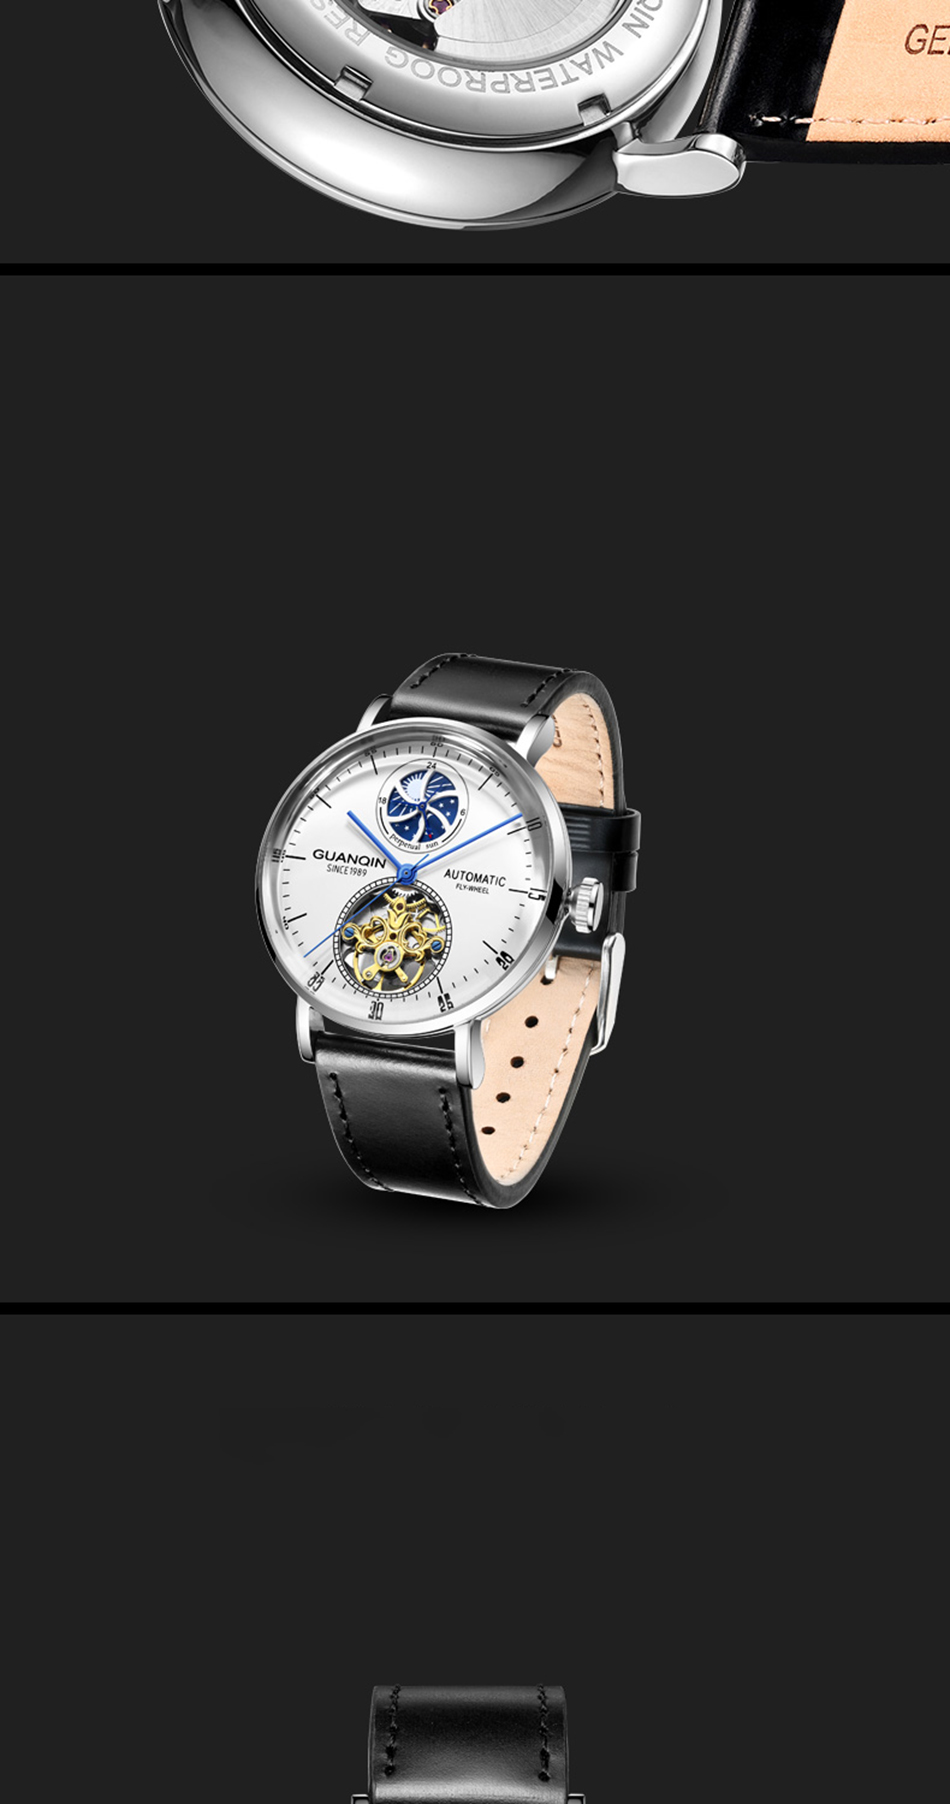 Guanqin 2019 relógio mecânico automático masculino tourbillon